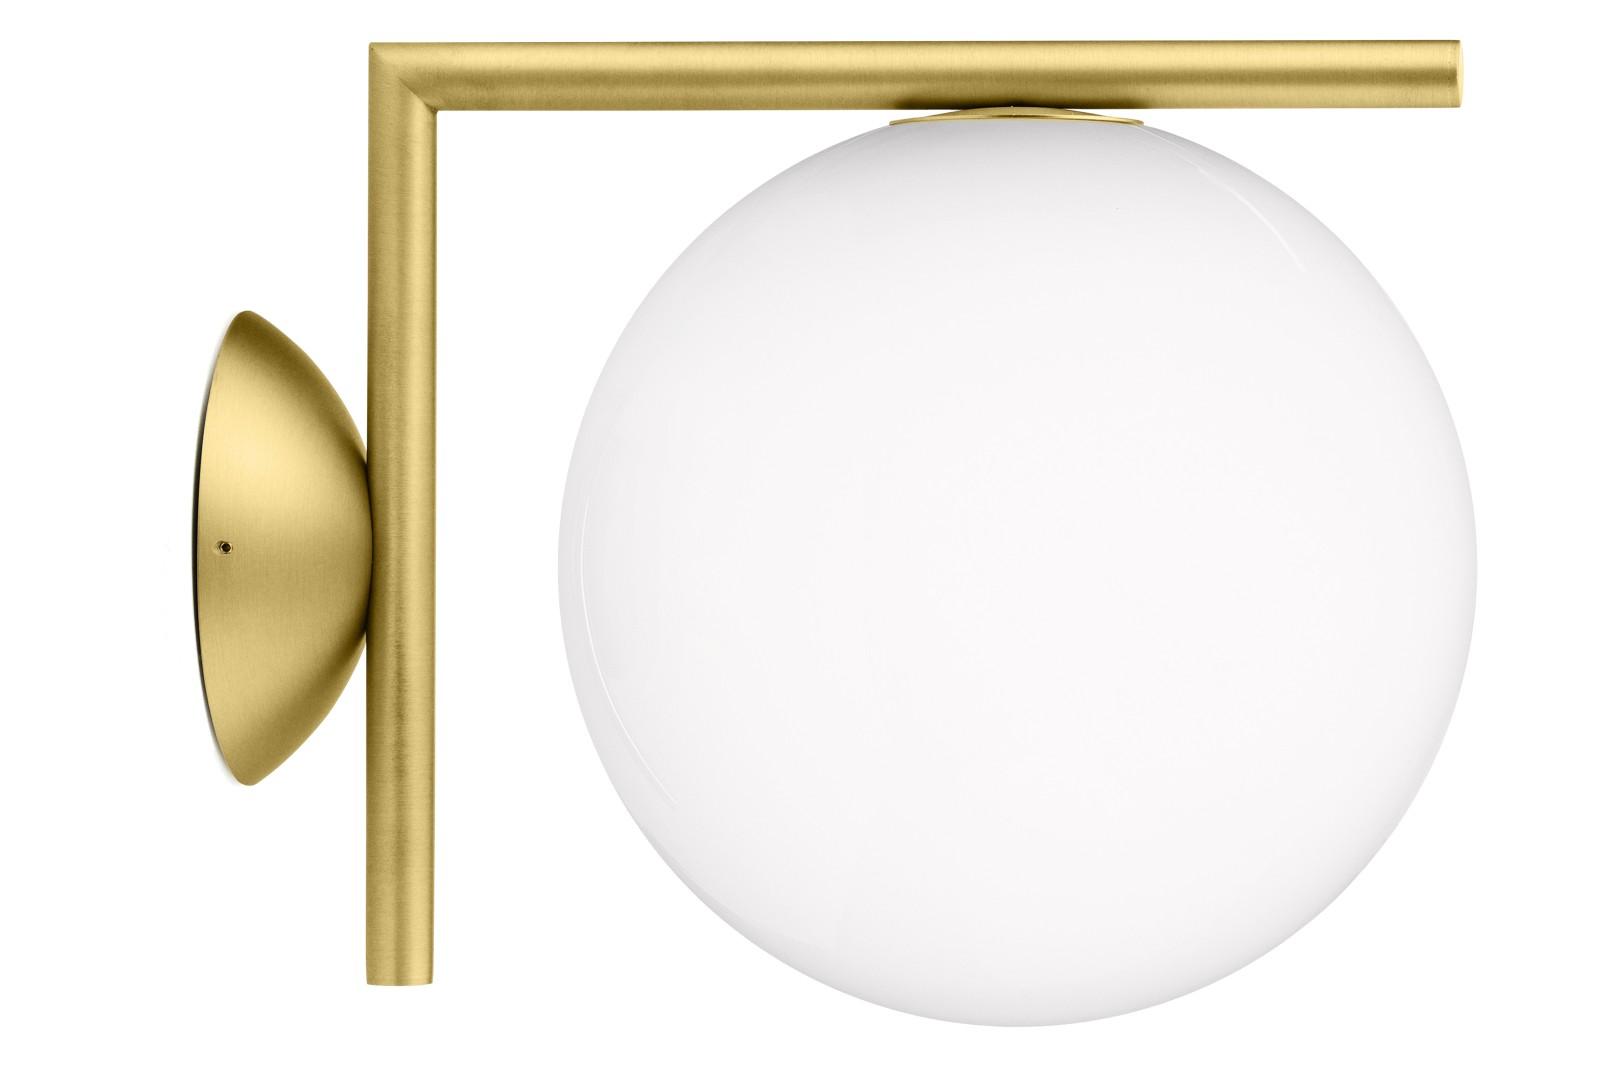 IC Wall Light C/W1, Brushed Brass, Small